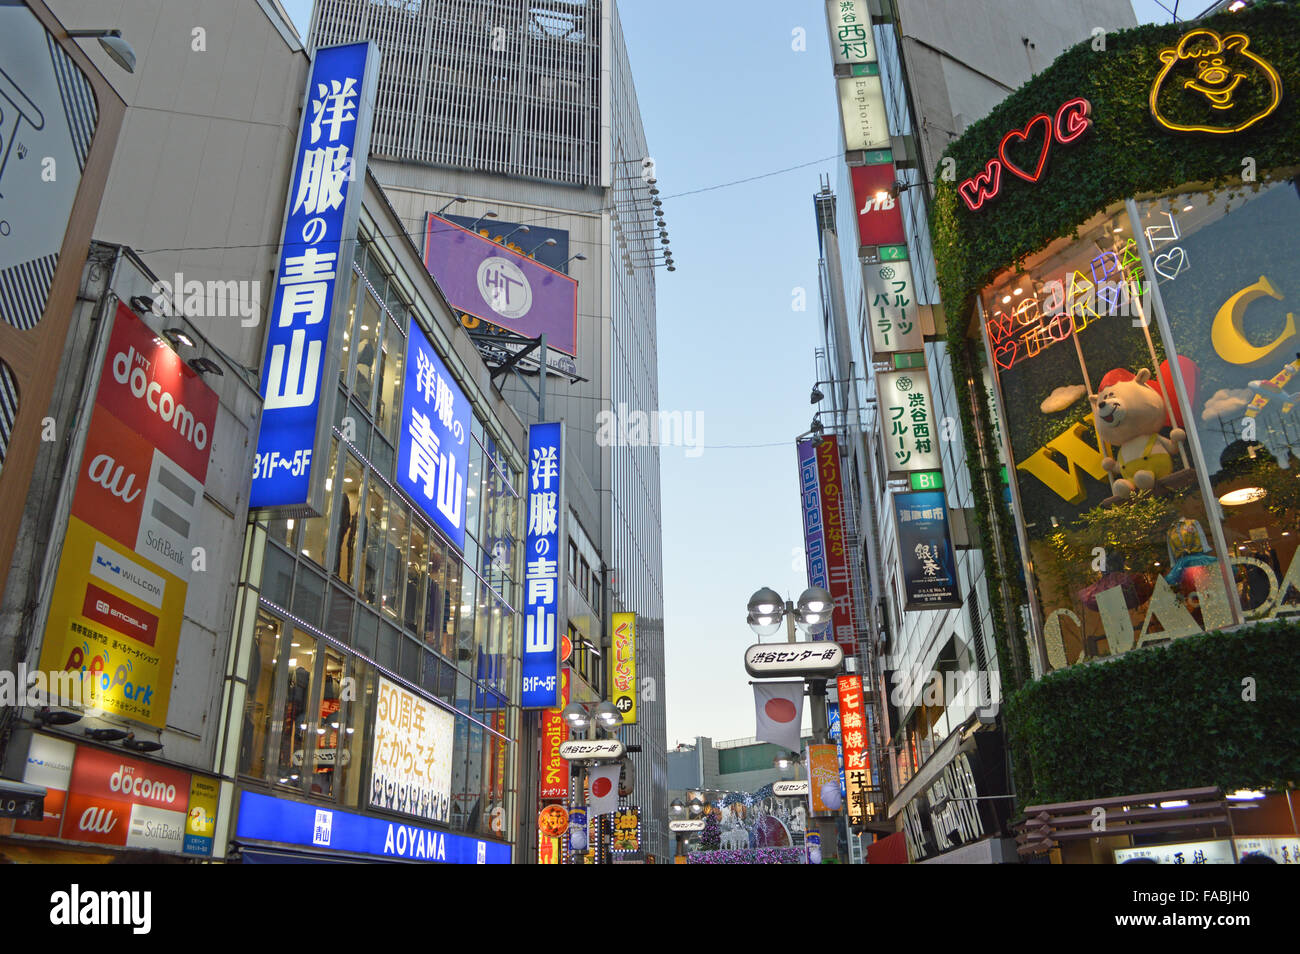 Shibuya in Tokyo - Stock Image